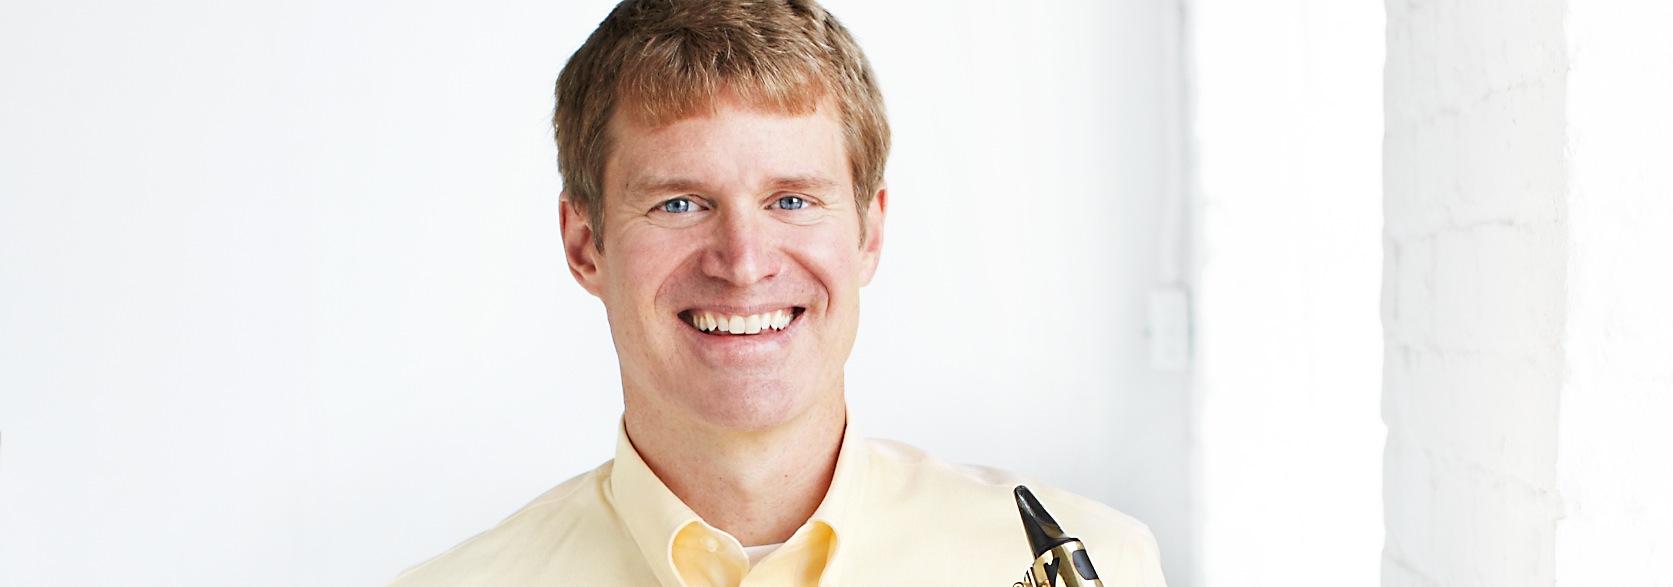 Steven Stusek, saxophone